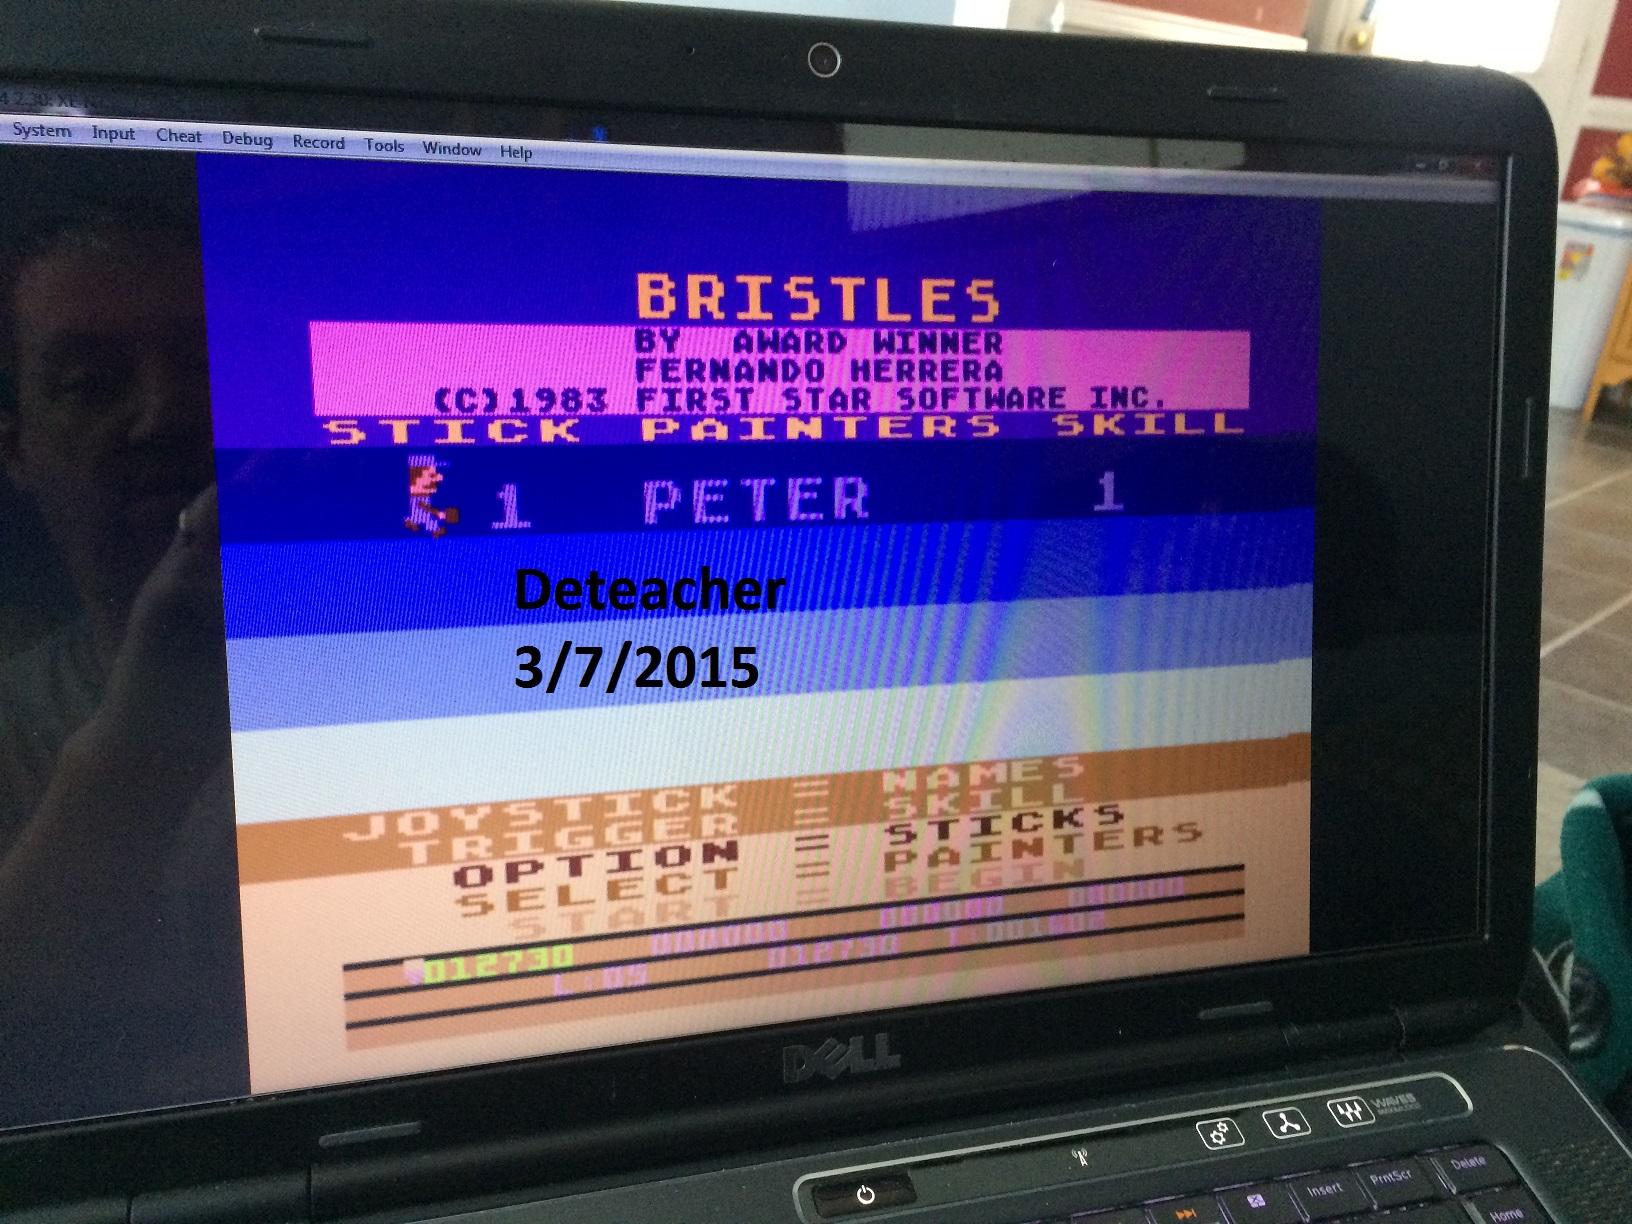 Bristles 12,730 points